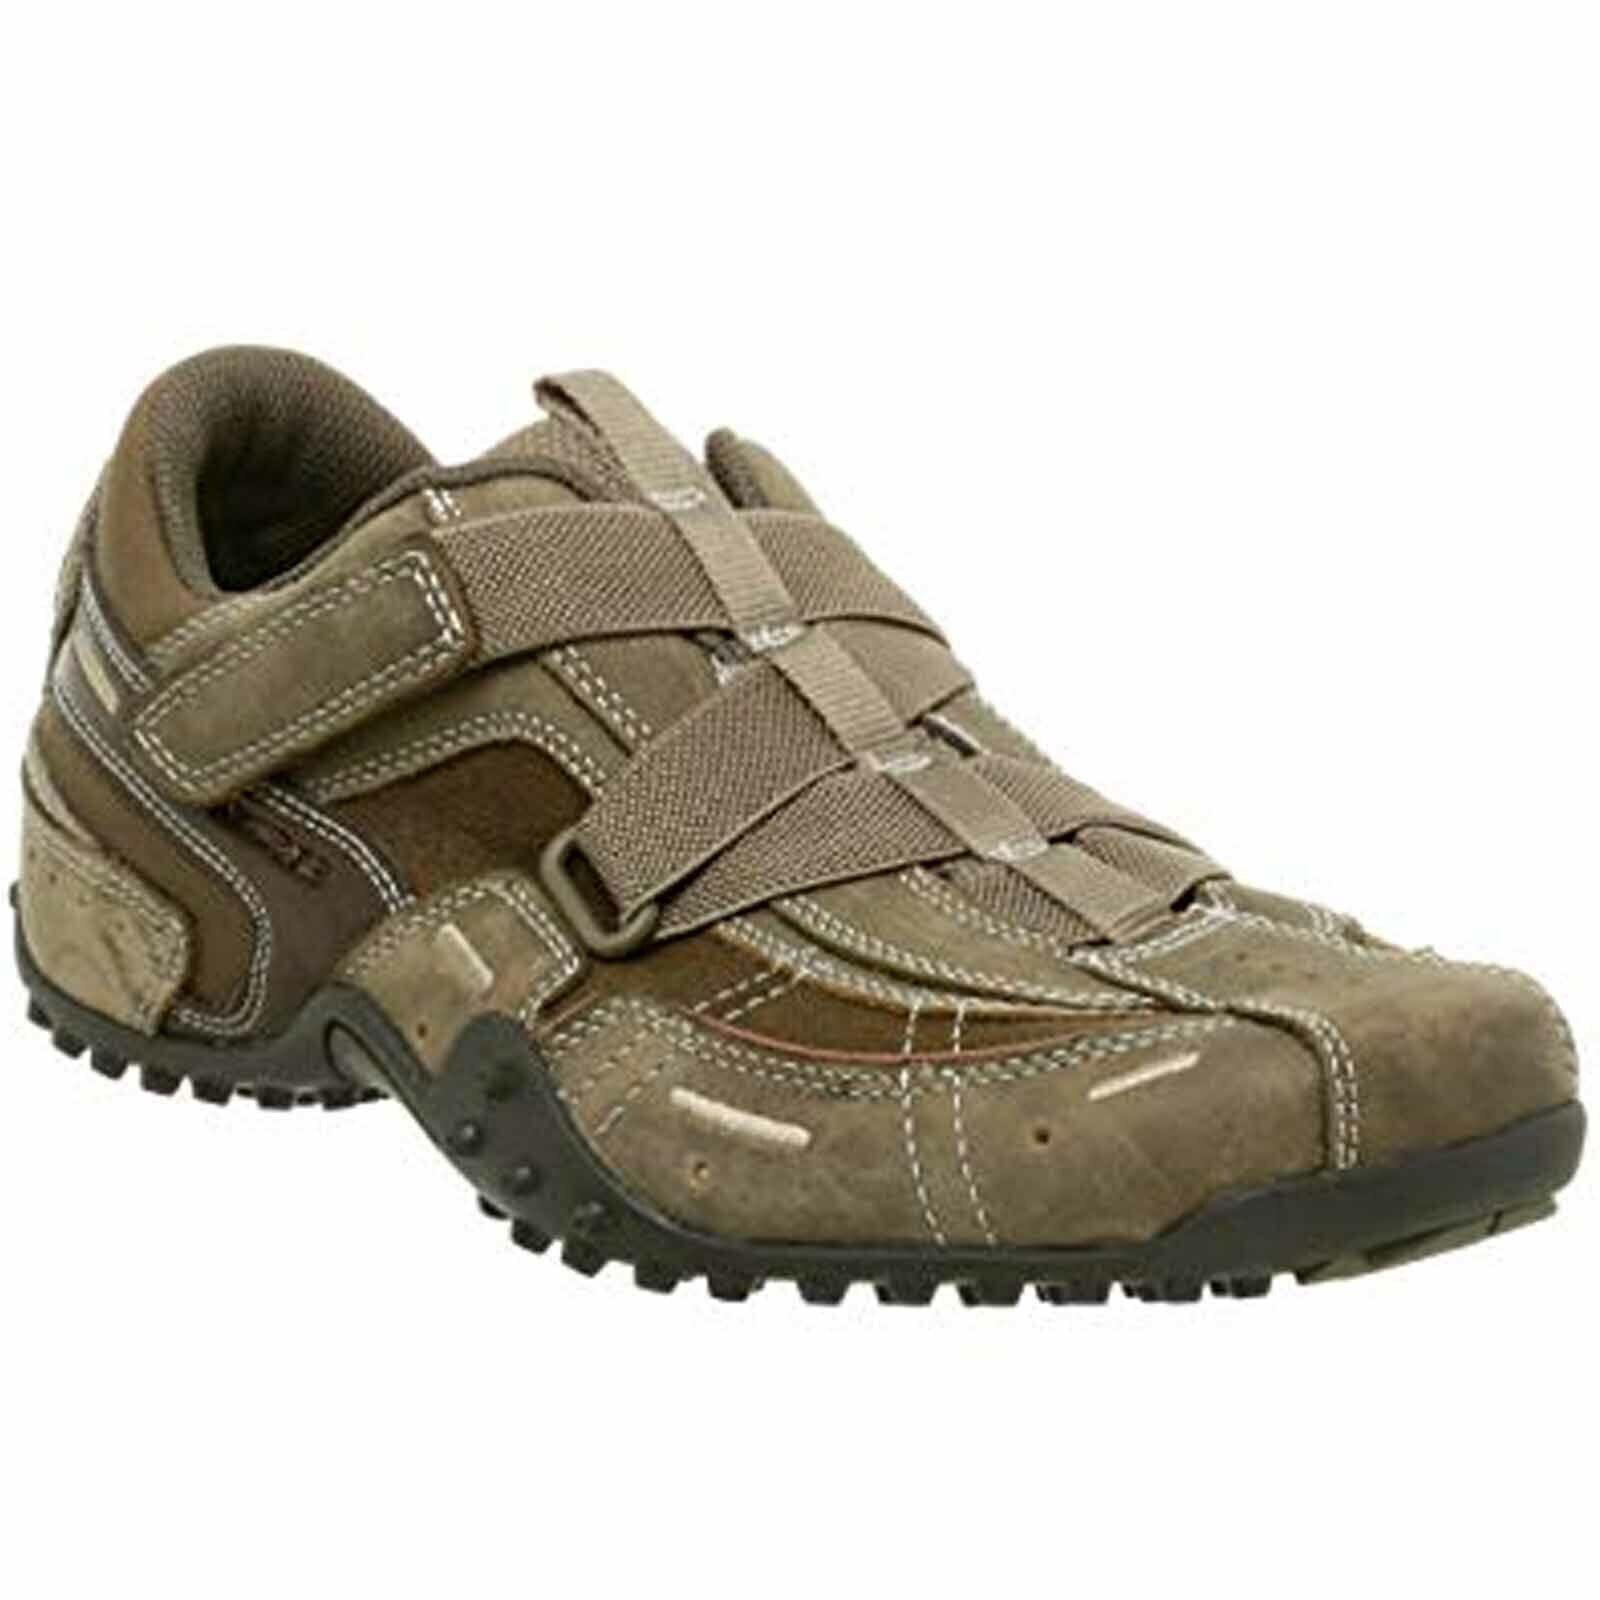 Skechers marter slippers men classic 999784 adjustable strap